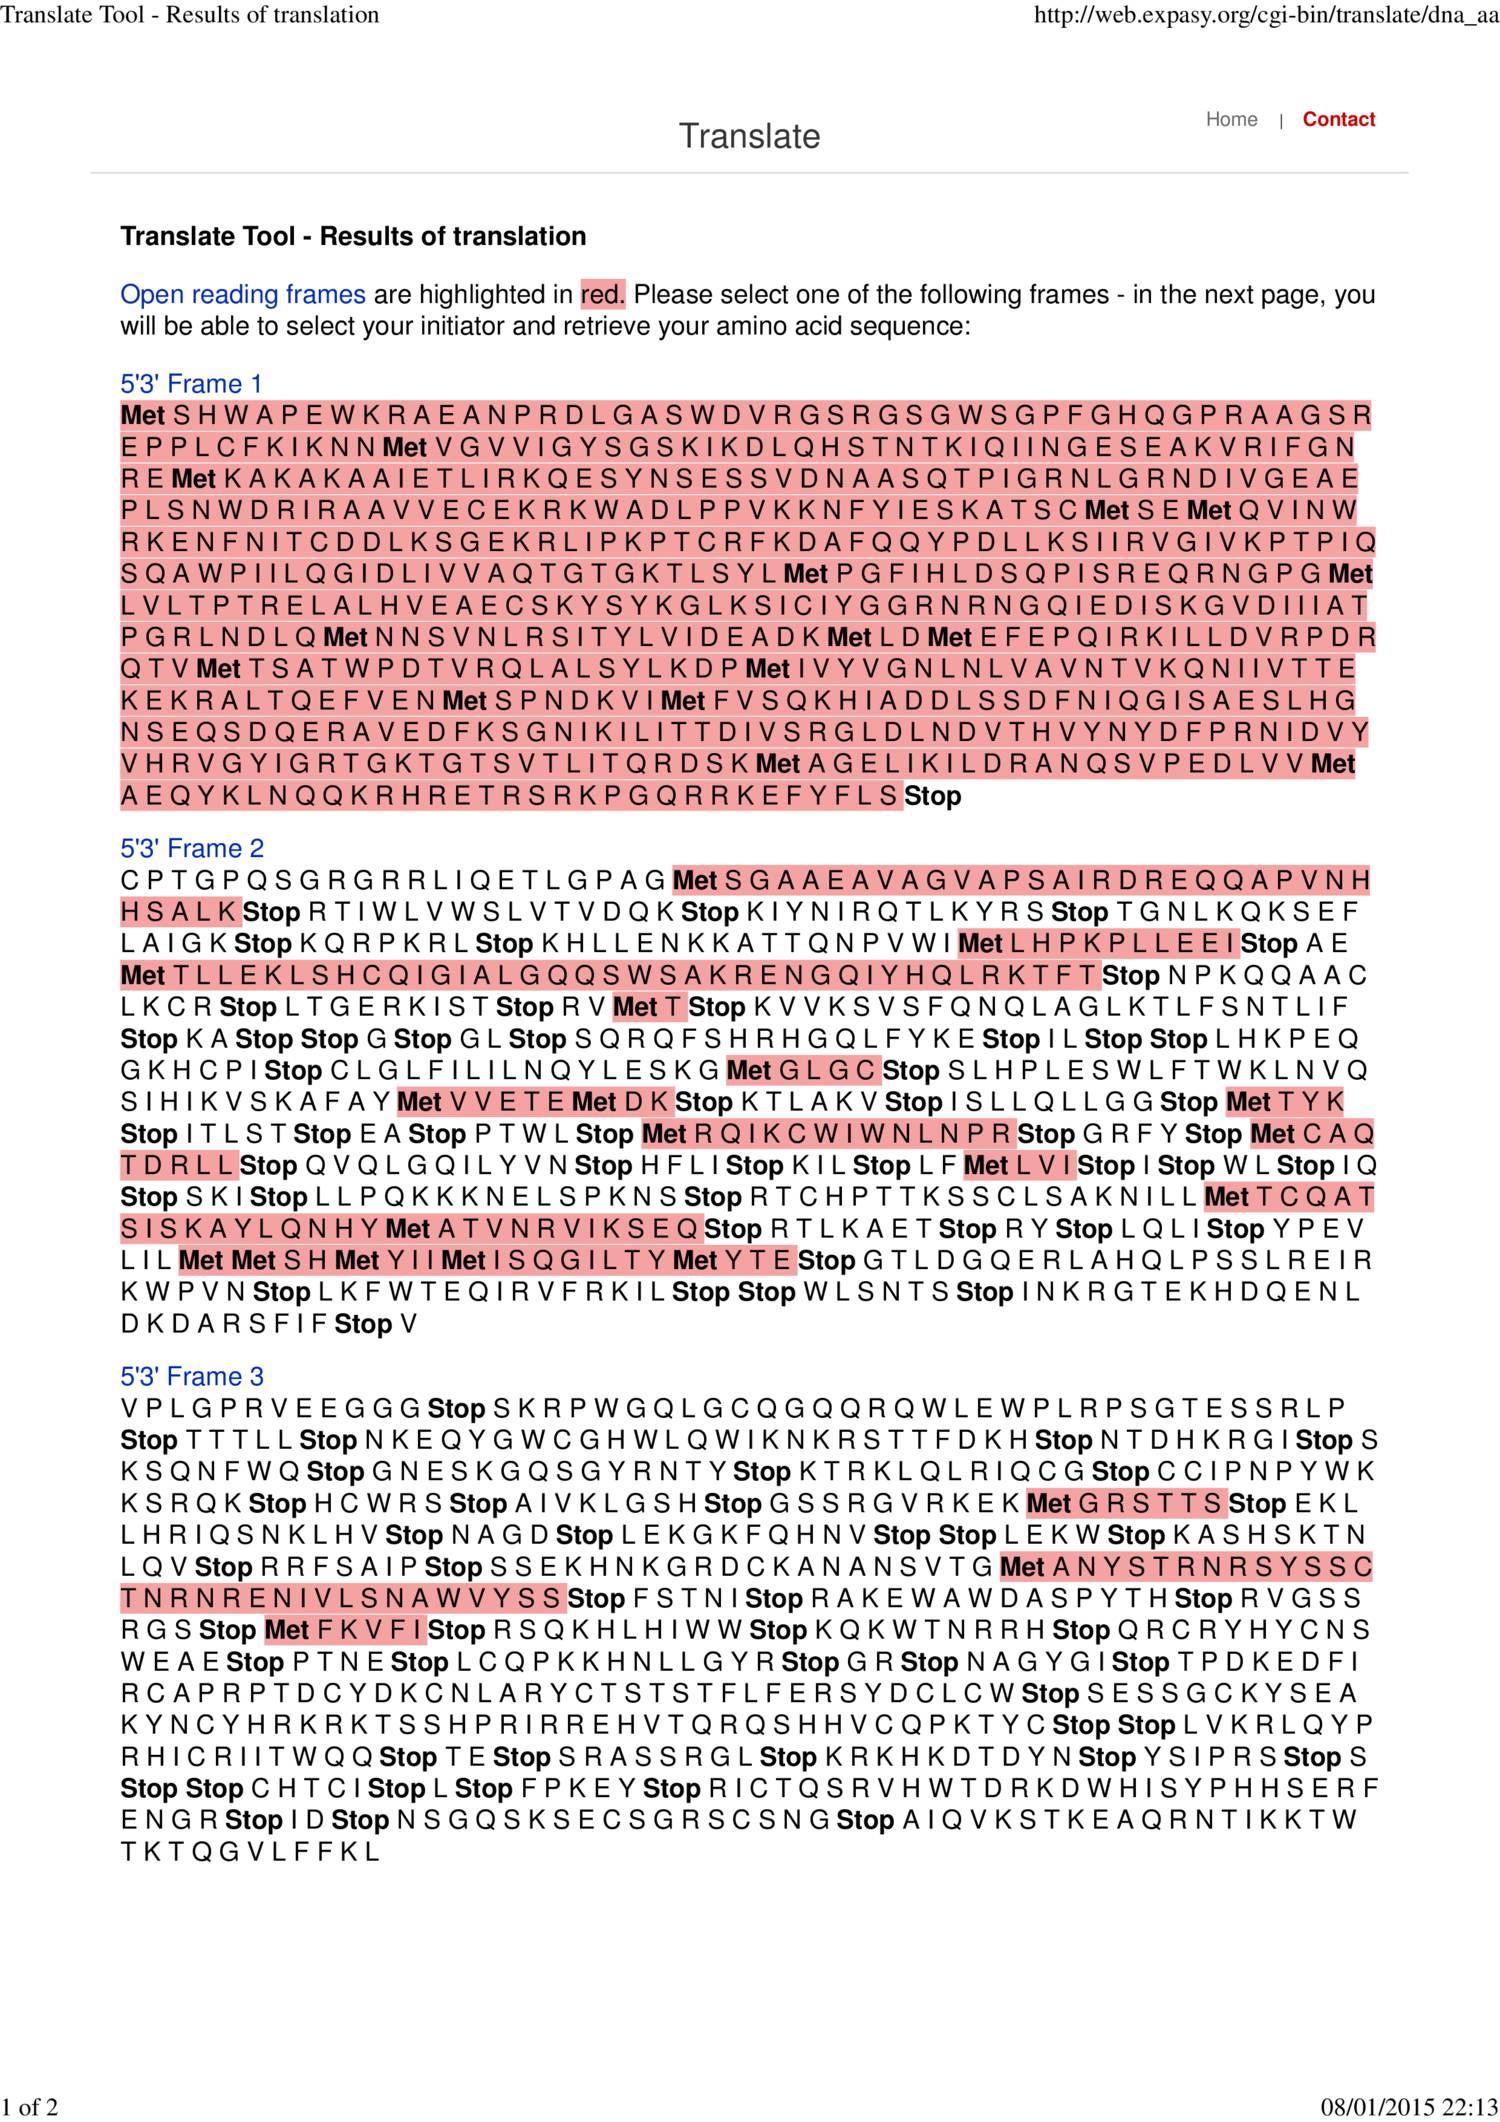 Contig 3 DDX53 Translate Tool - Results of translation pdf   DocDroid